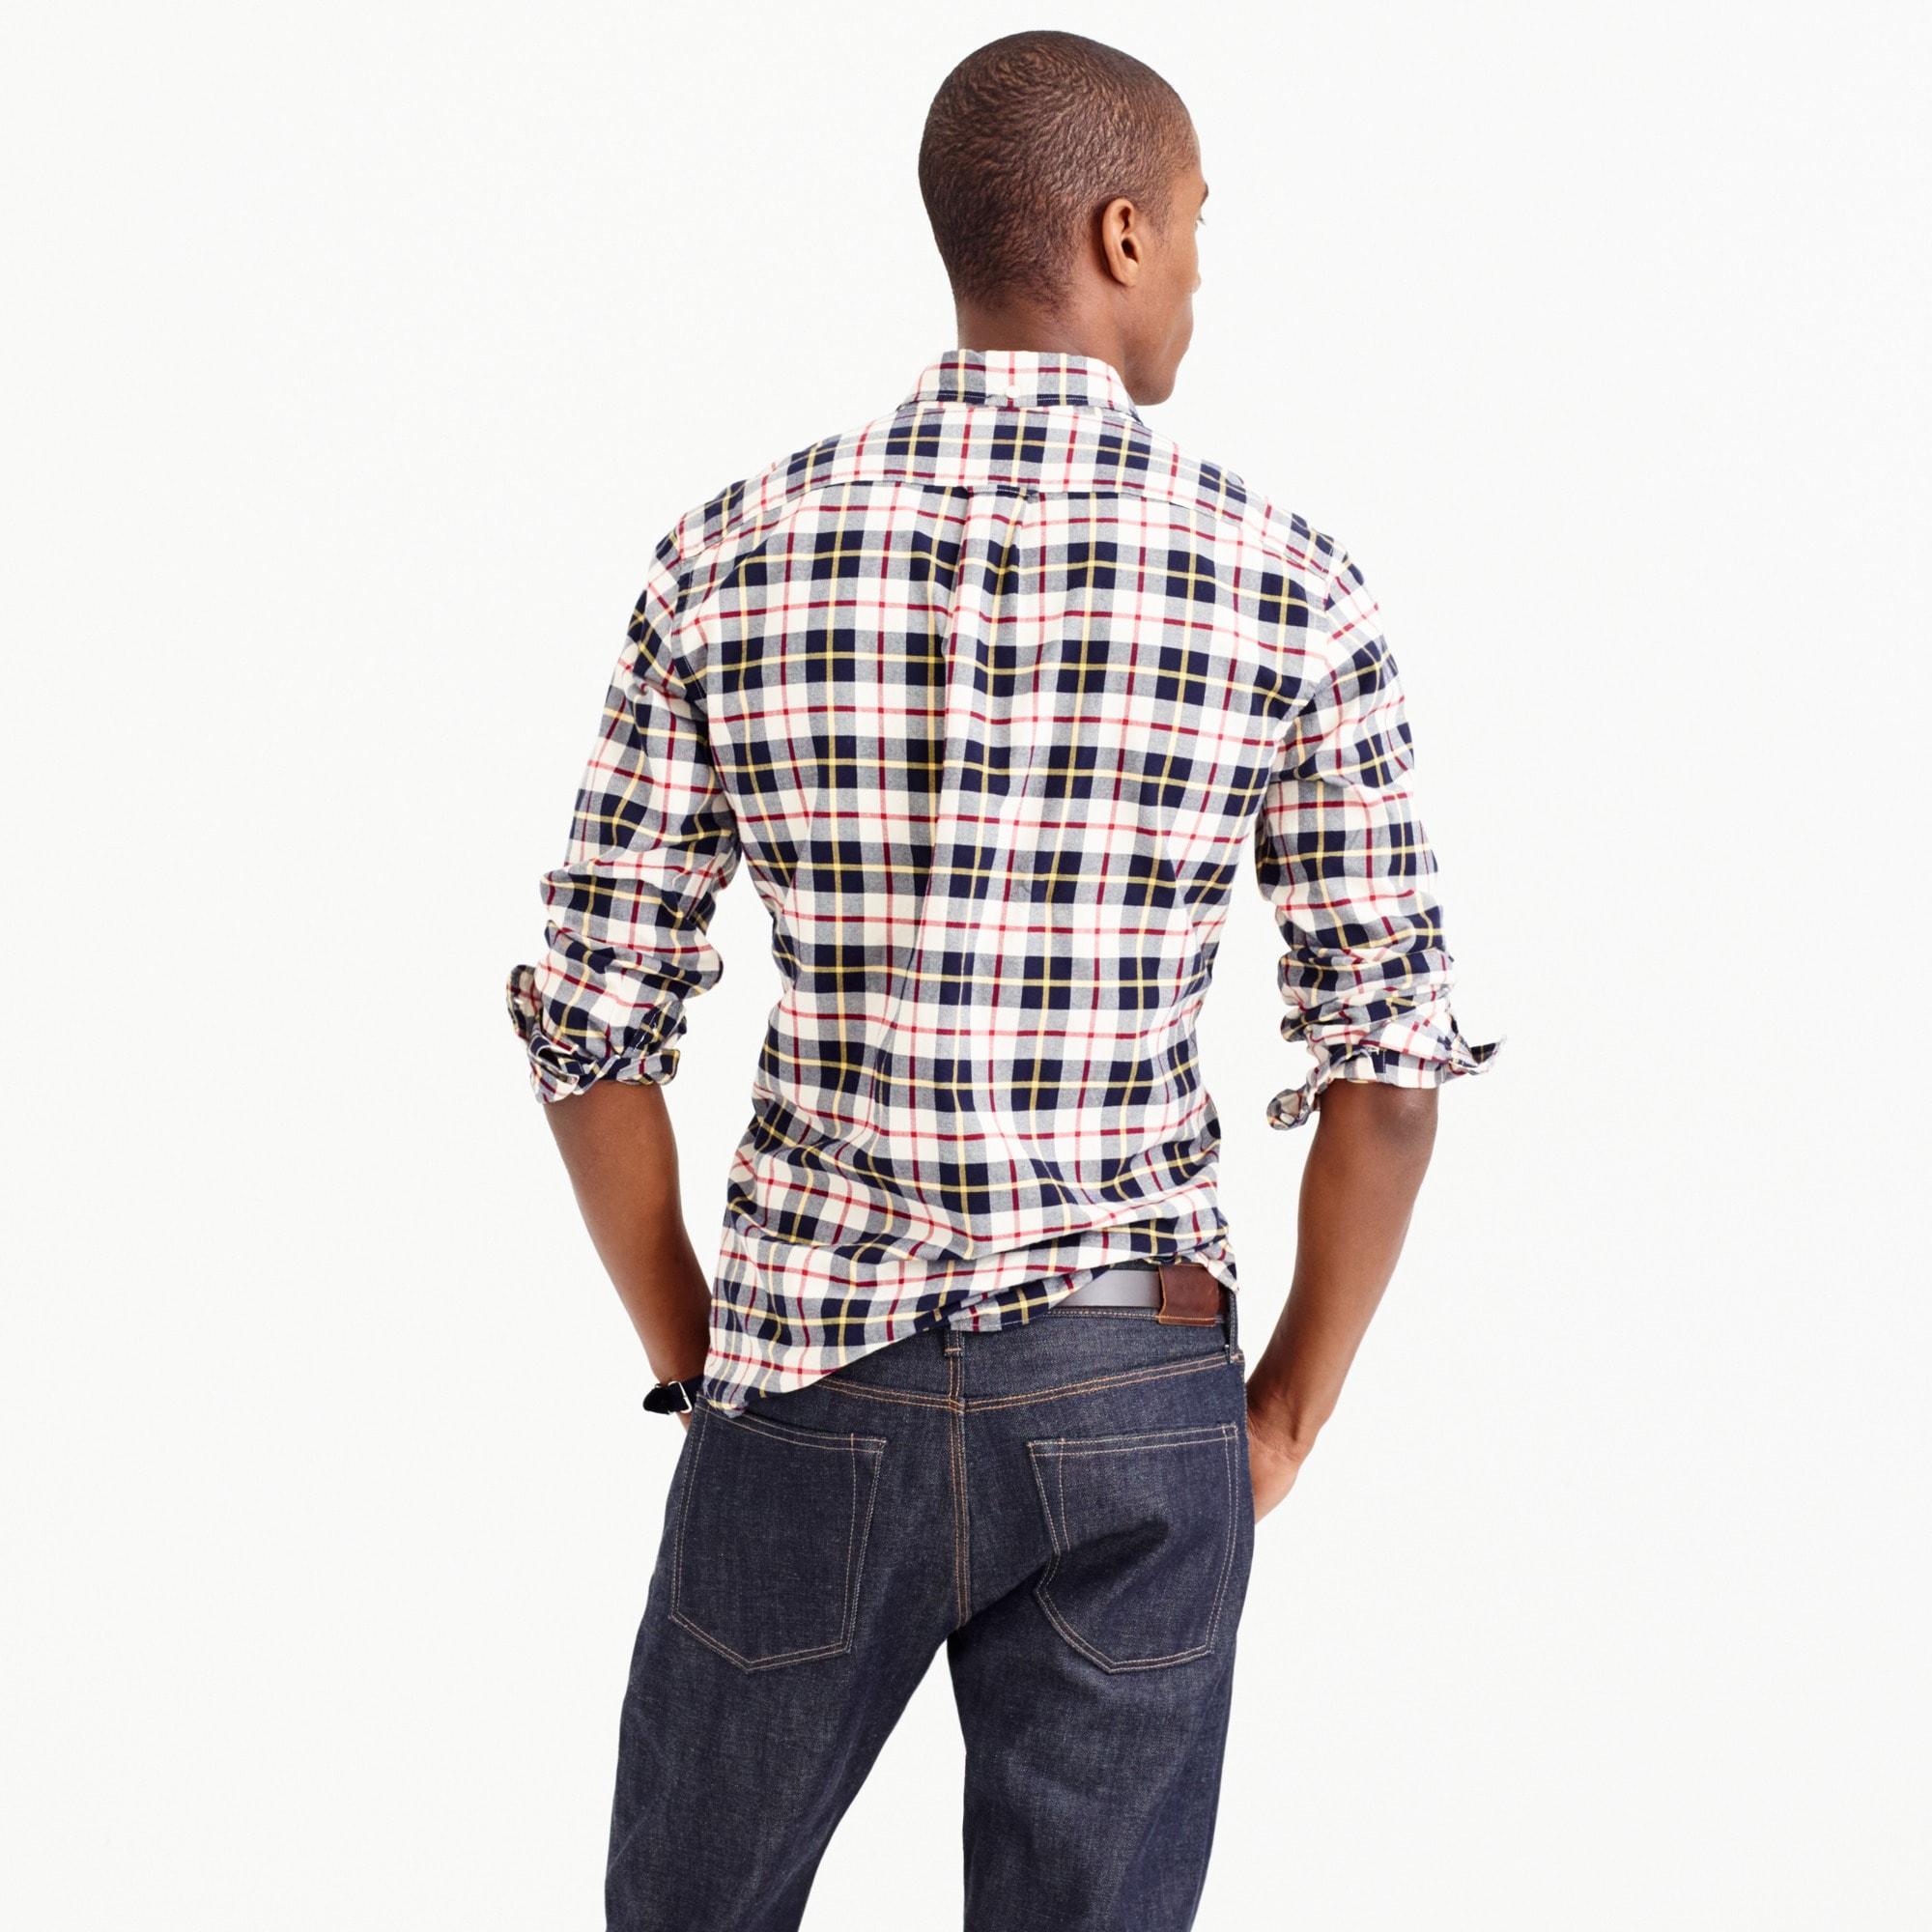 Slim vintage oxford shirt in Kelly plaid